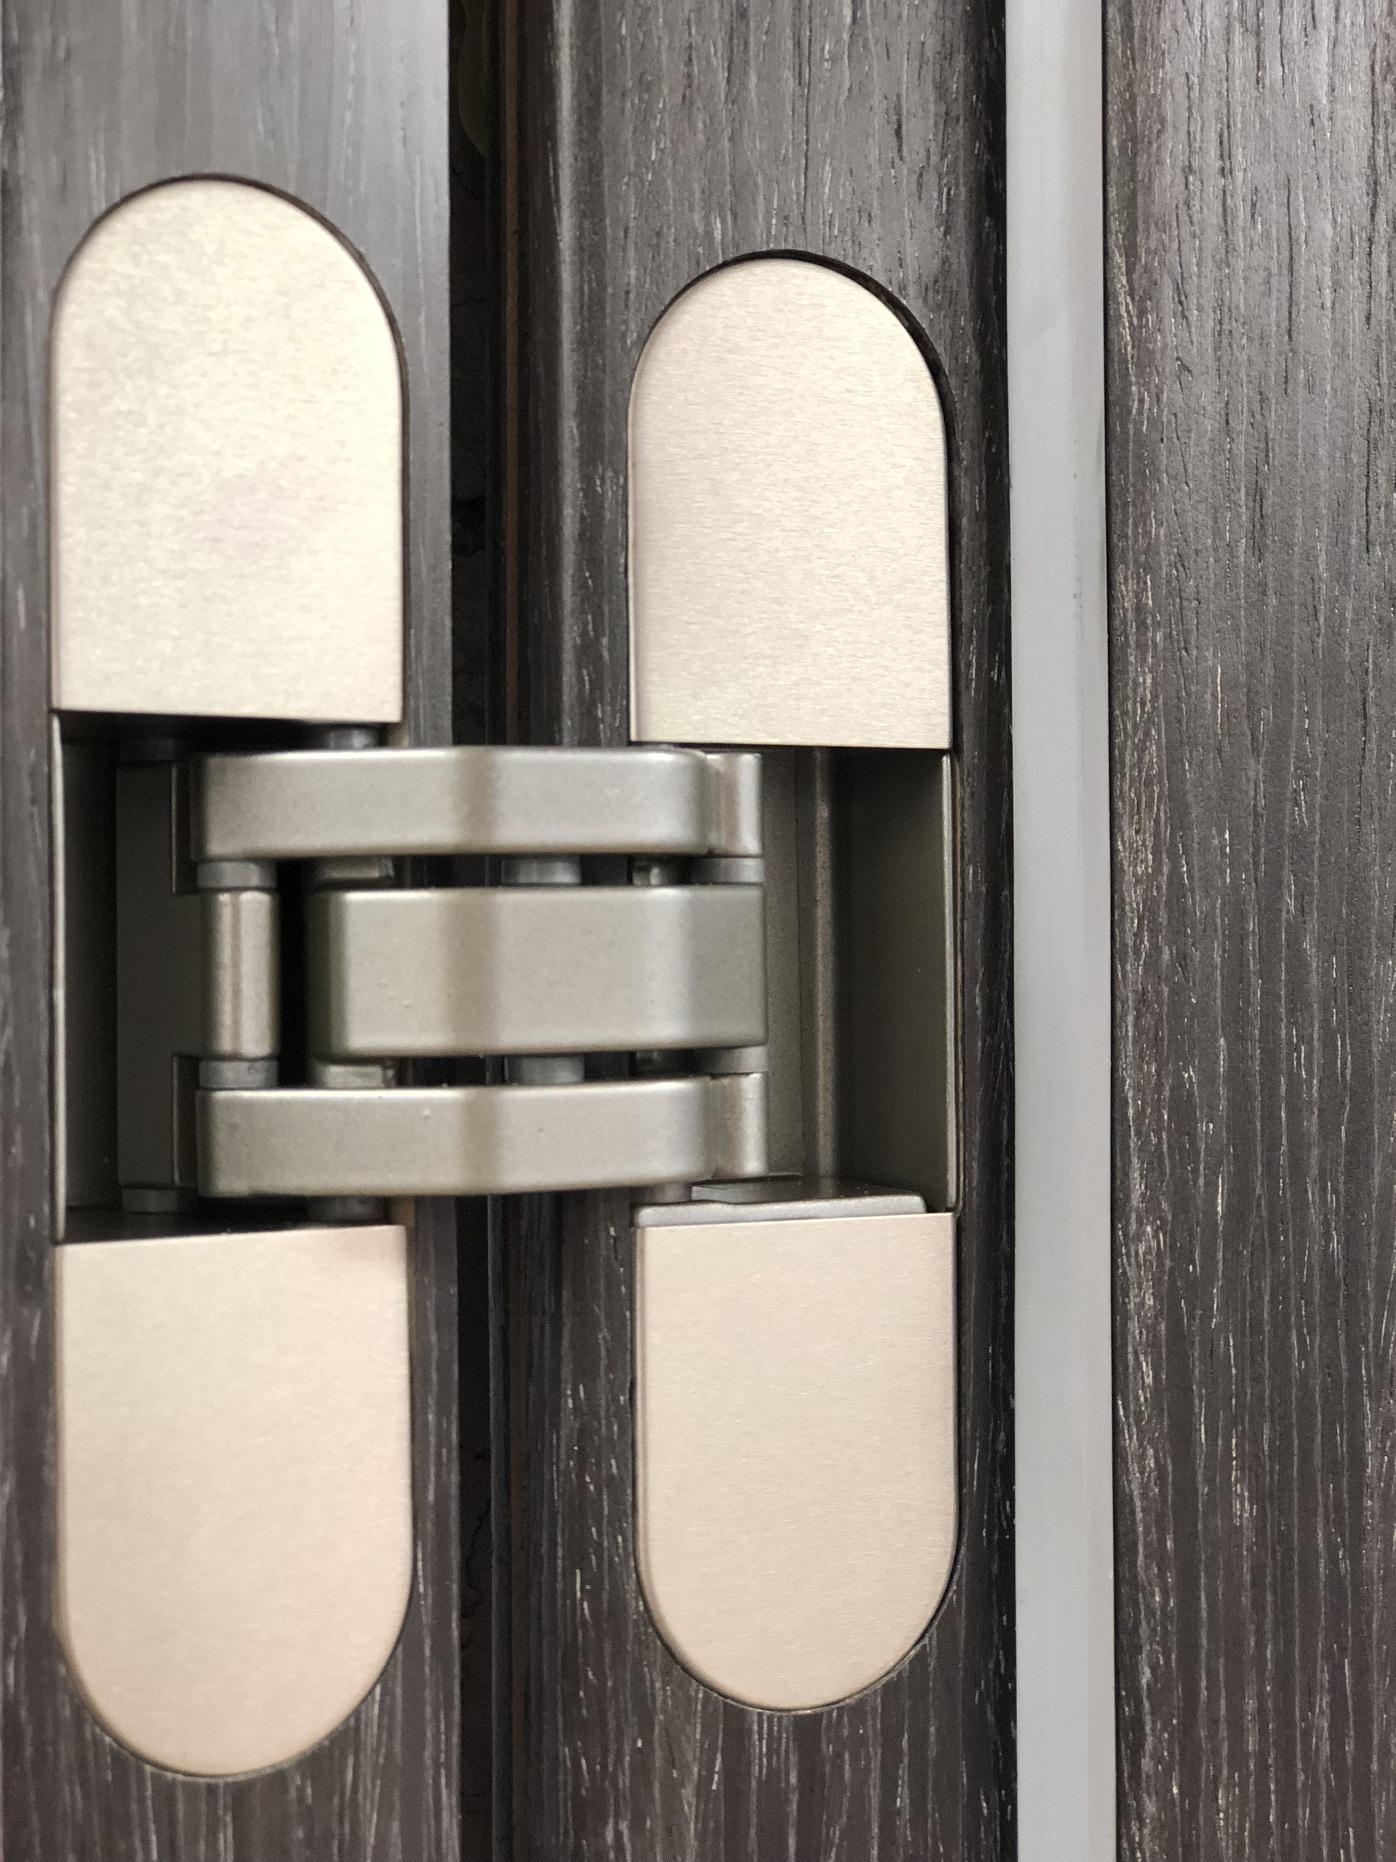 Image Versa Interior Door Black Apricot 2